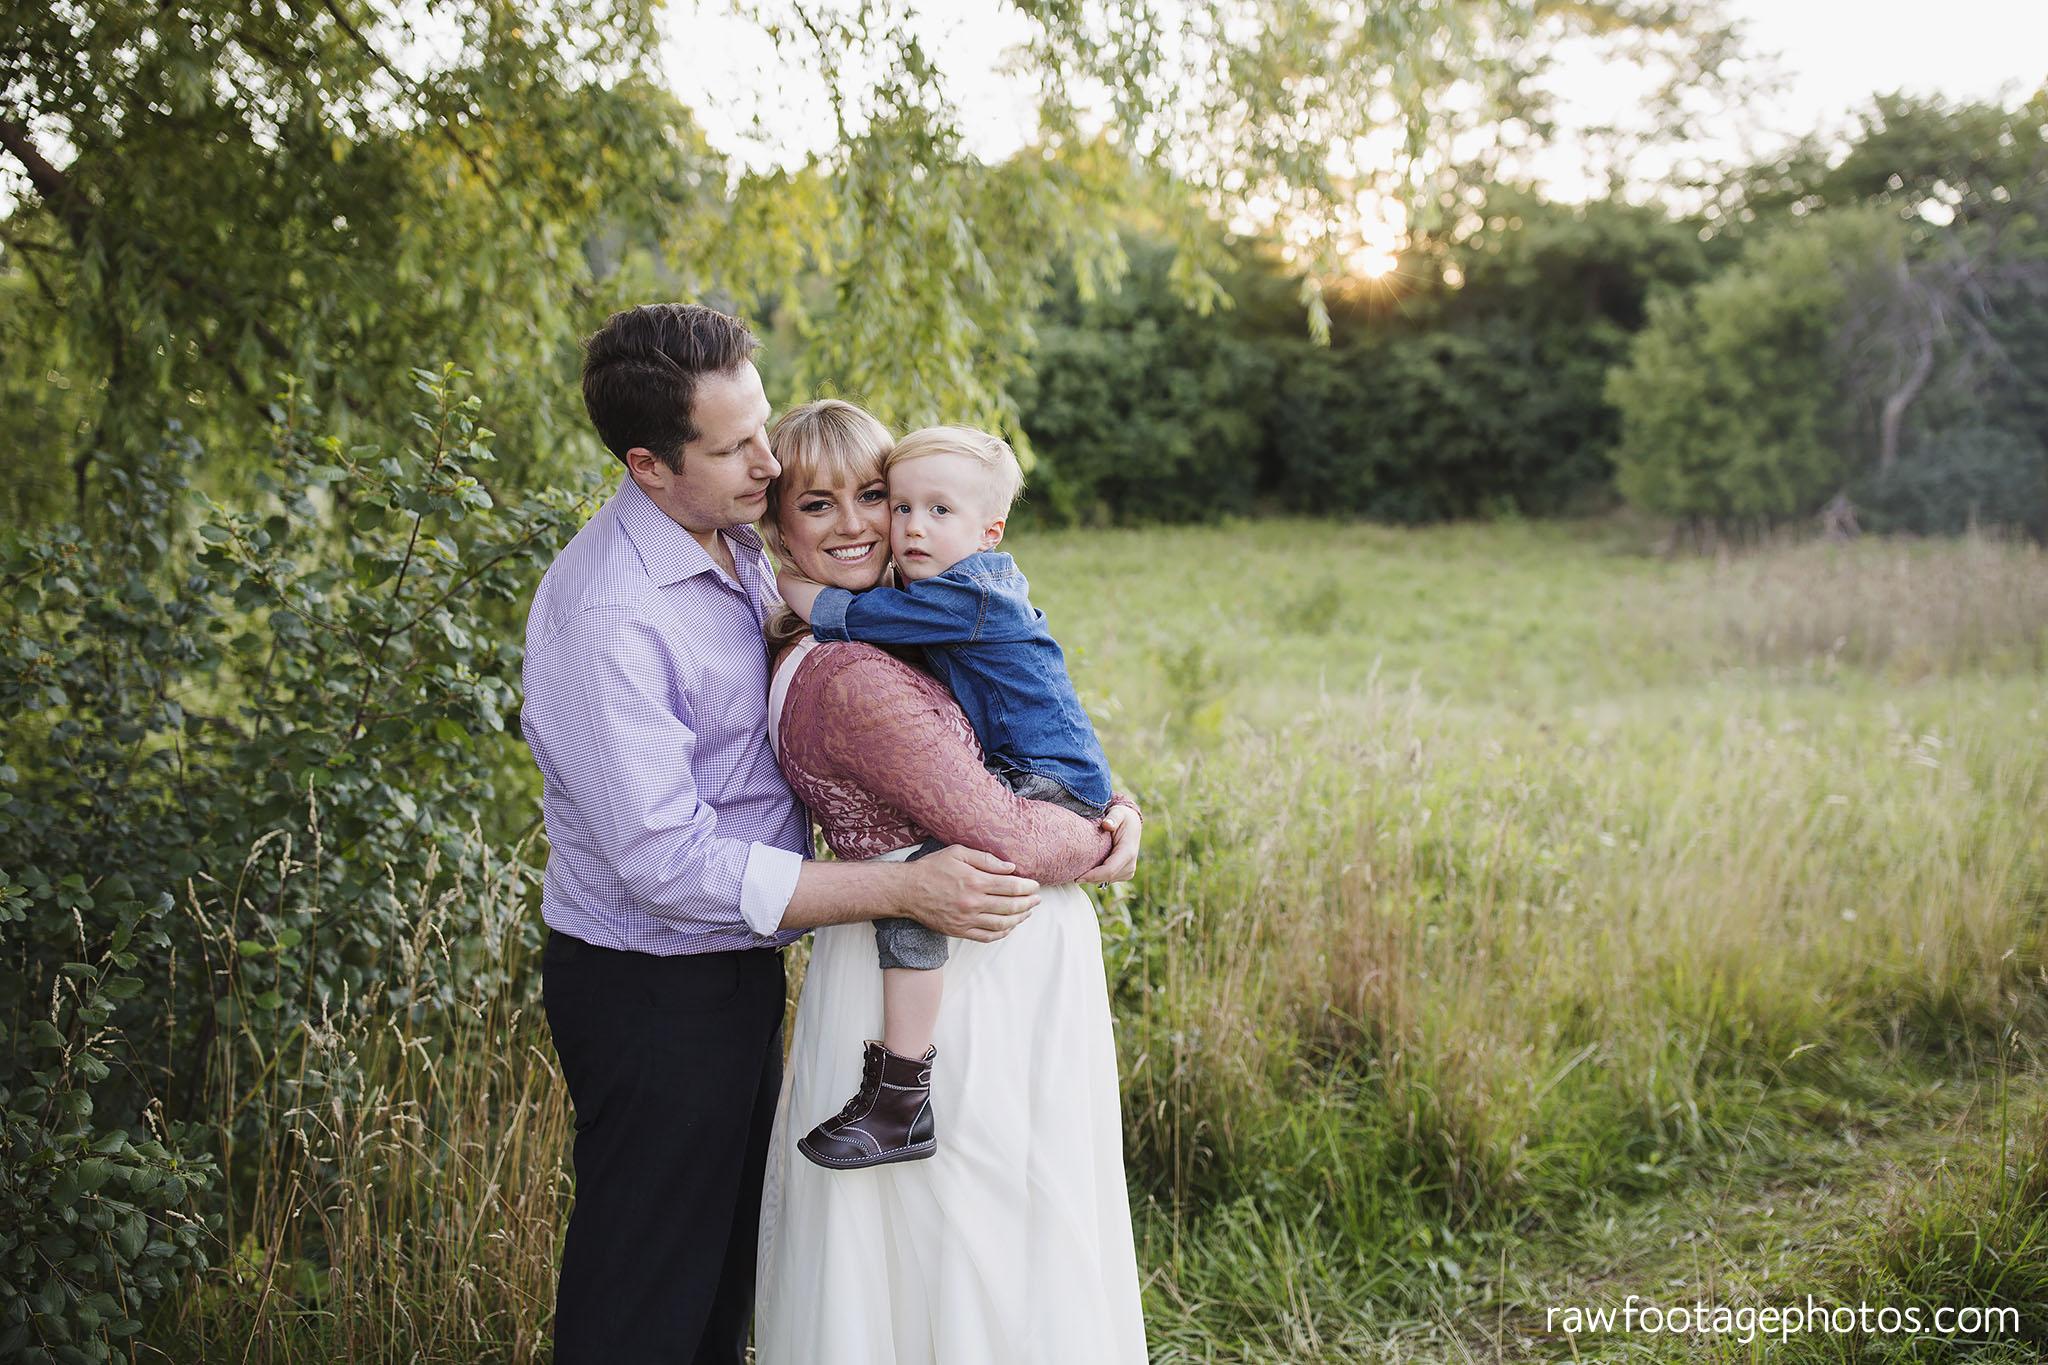 London_Ontario_Photographer-family_photography-pet_photography-lifestyle_photography019.jpg